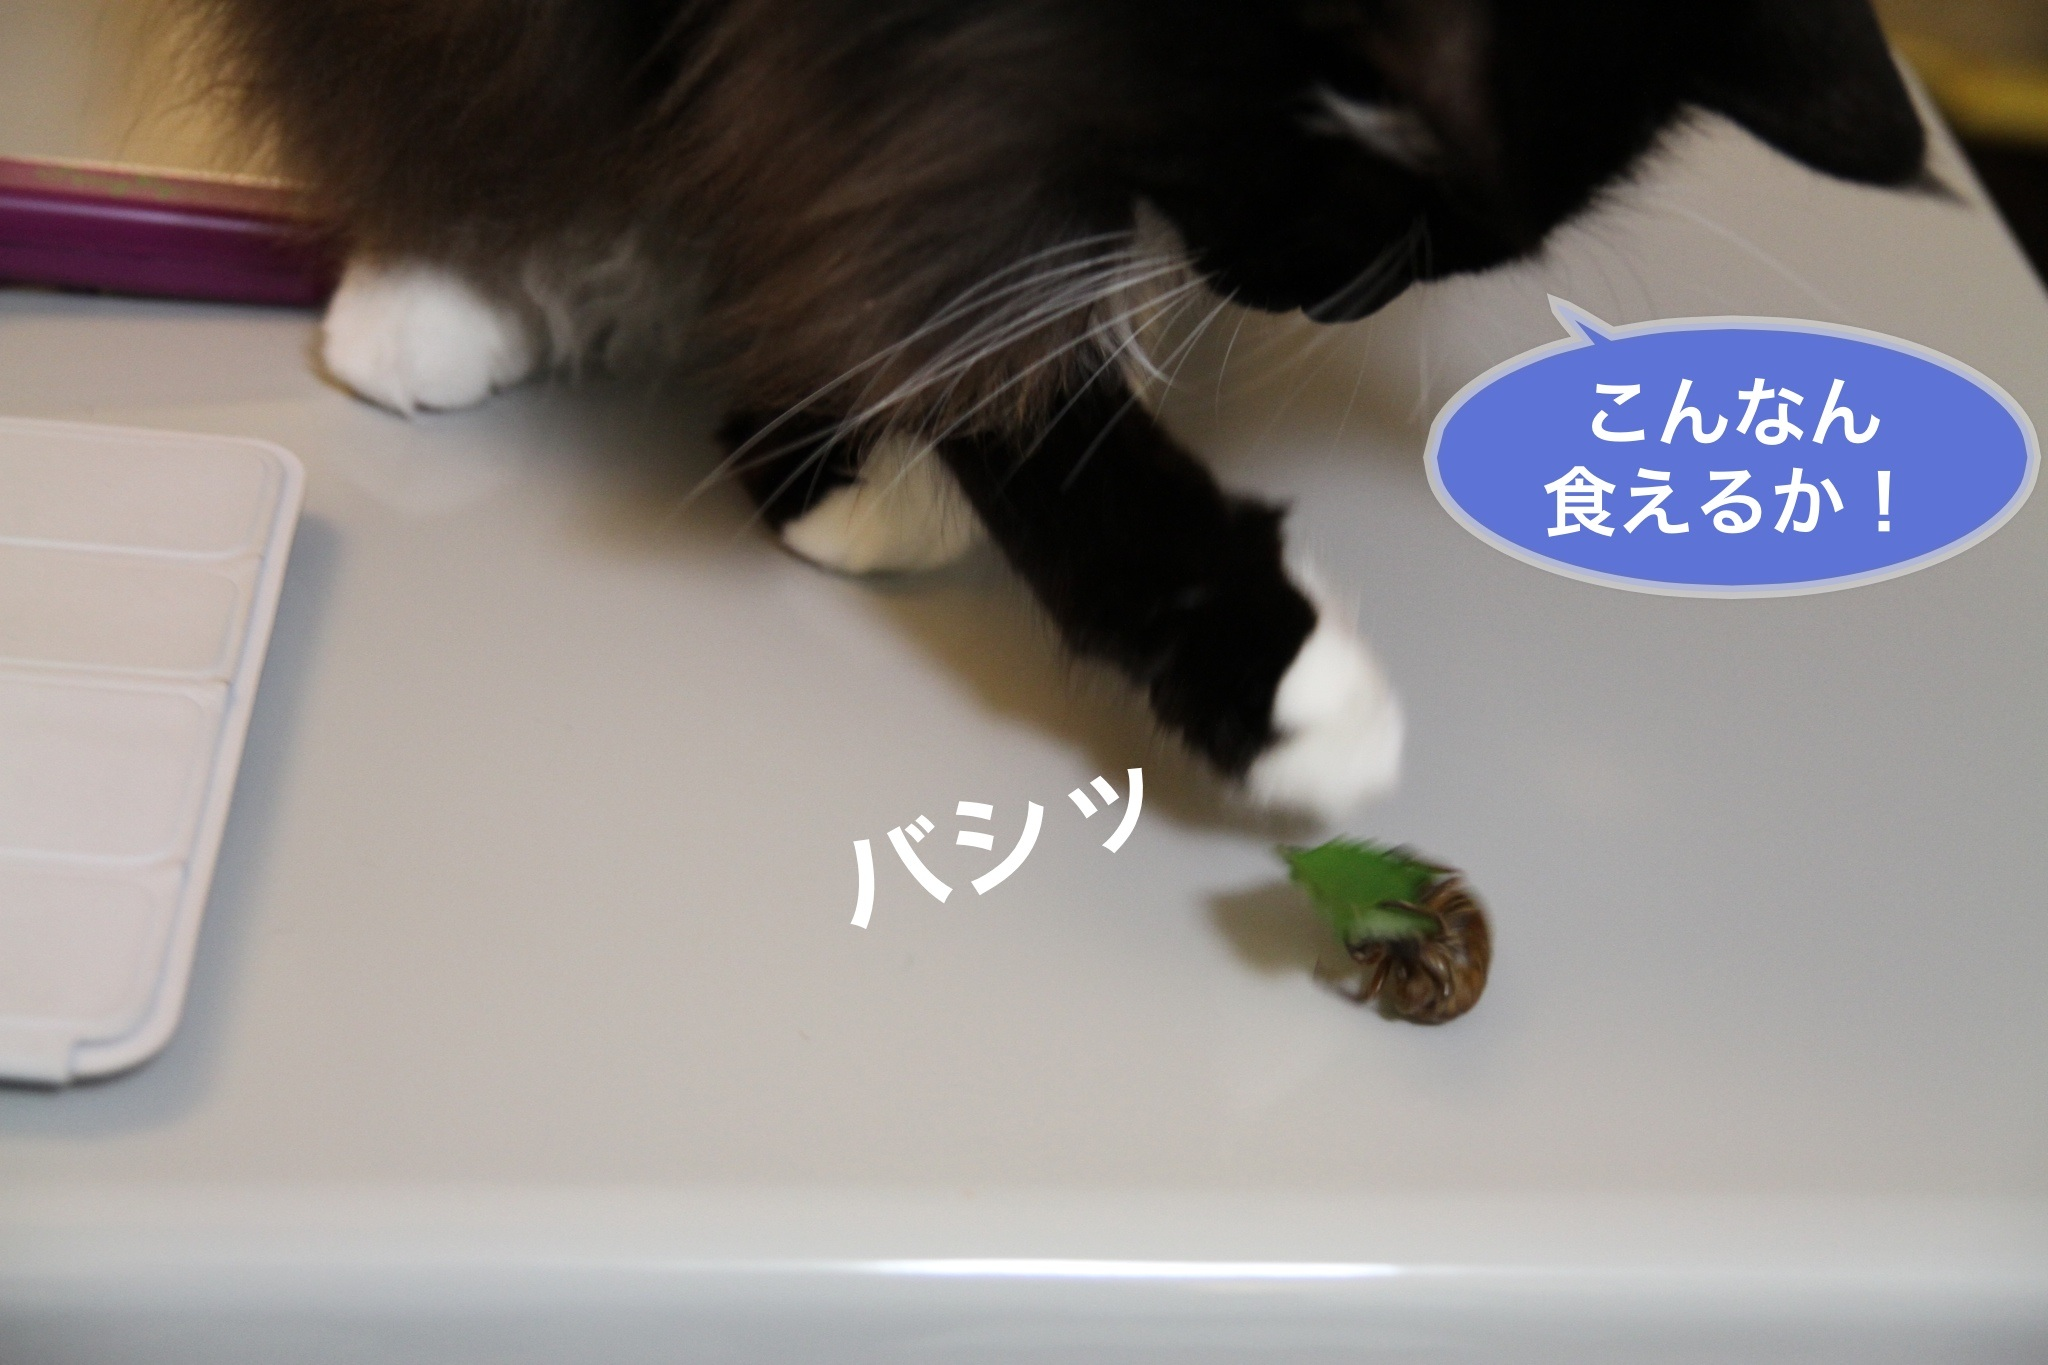 image_20130824174619dfe.jpg